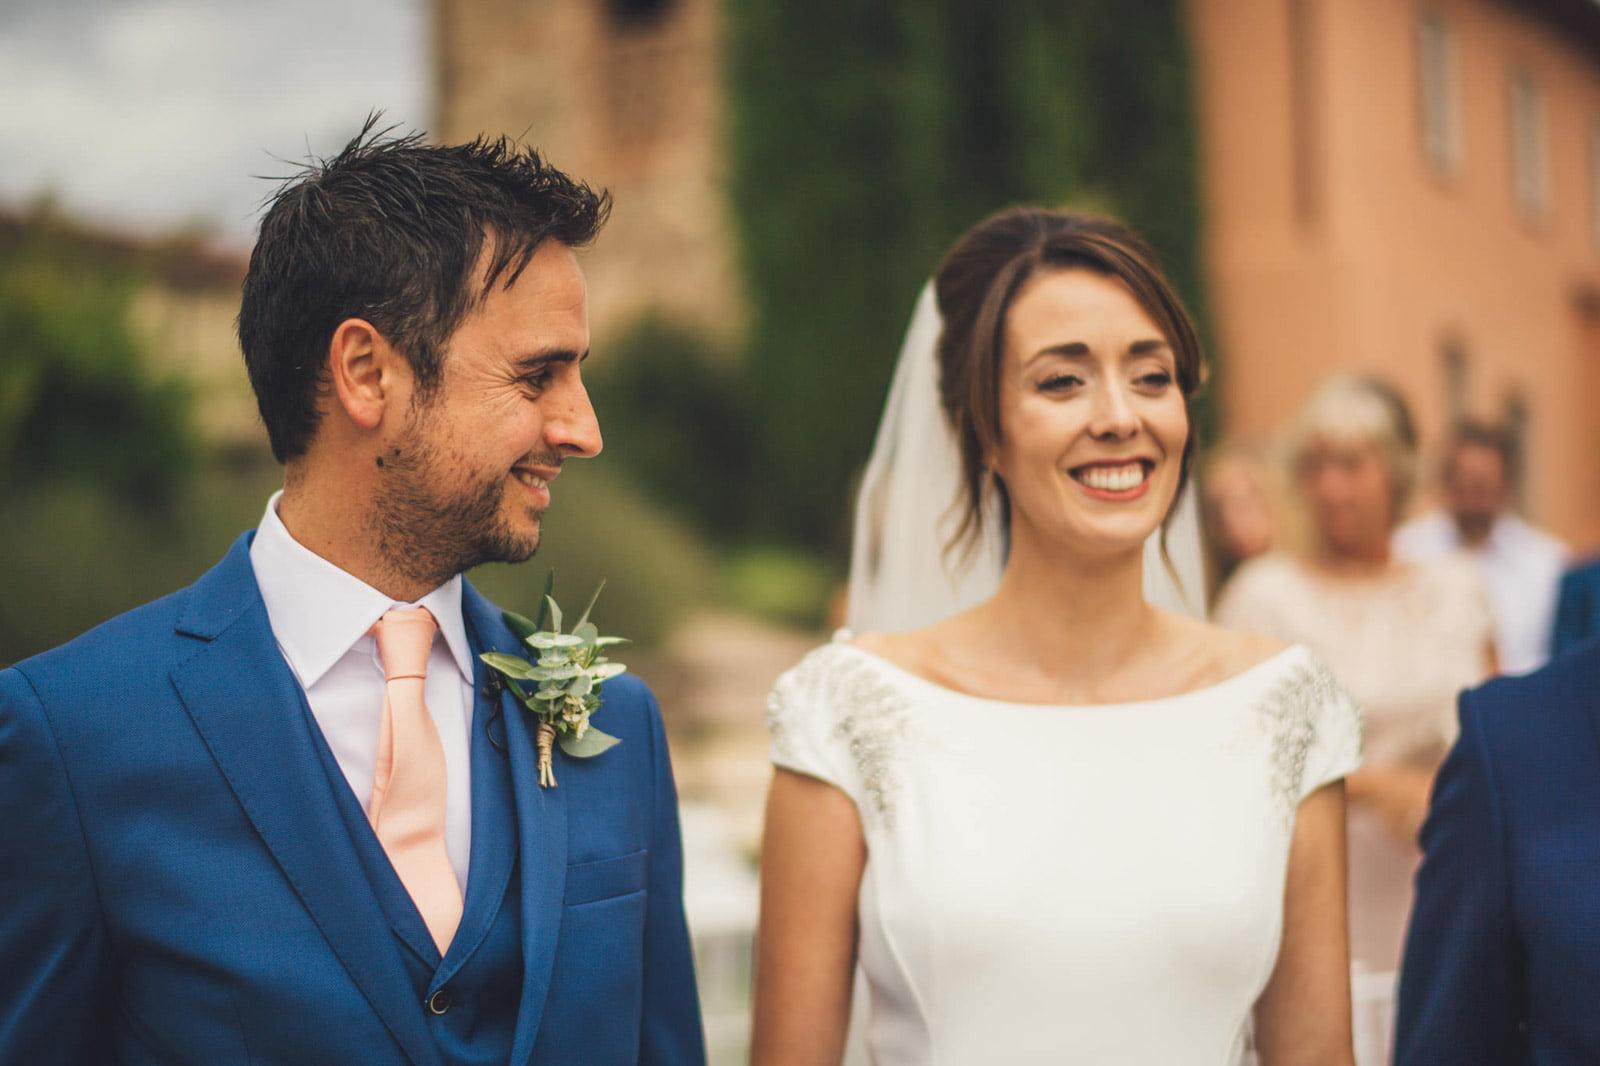 050-wedding-tuscany-san-galgano-federico-pannacci-photographer